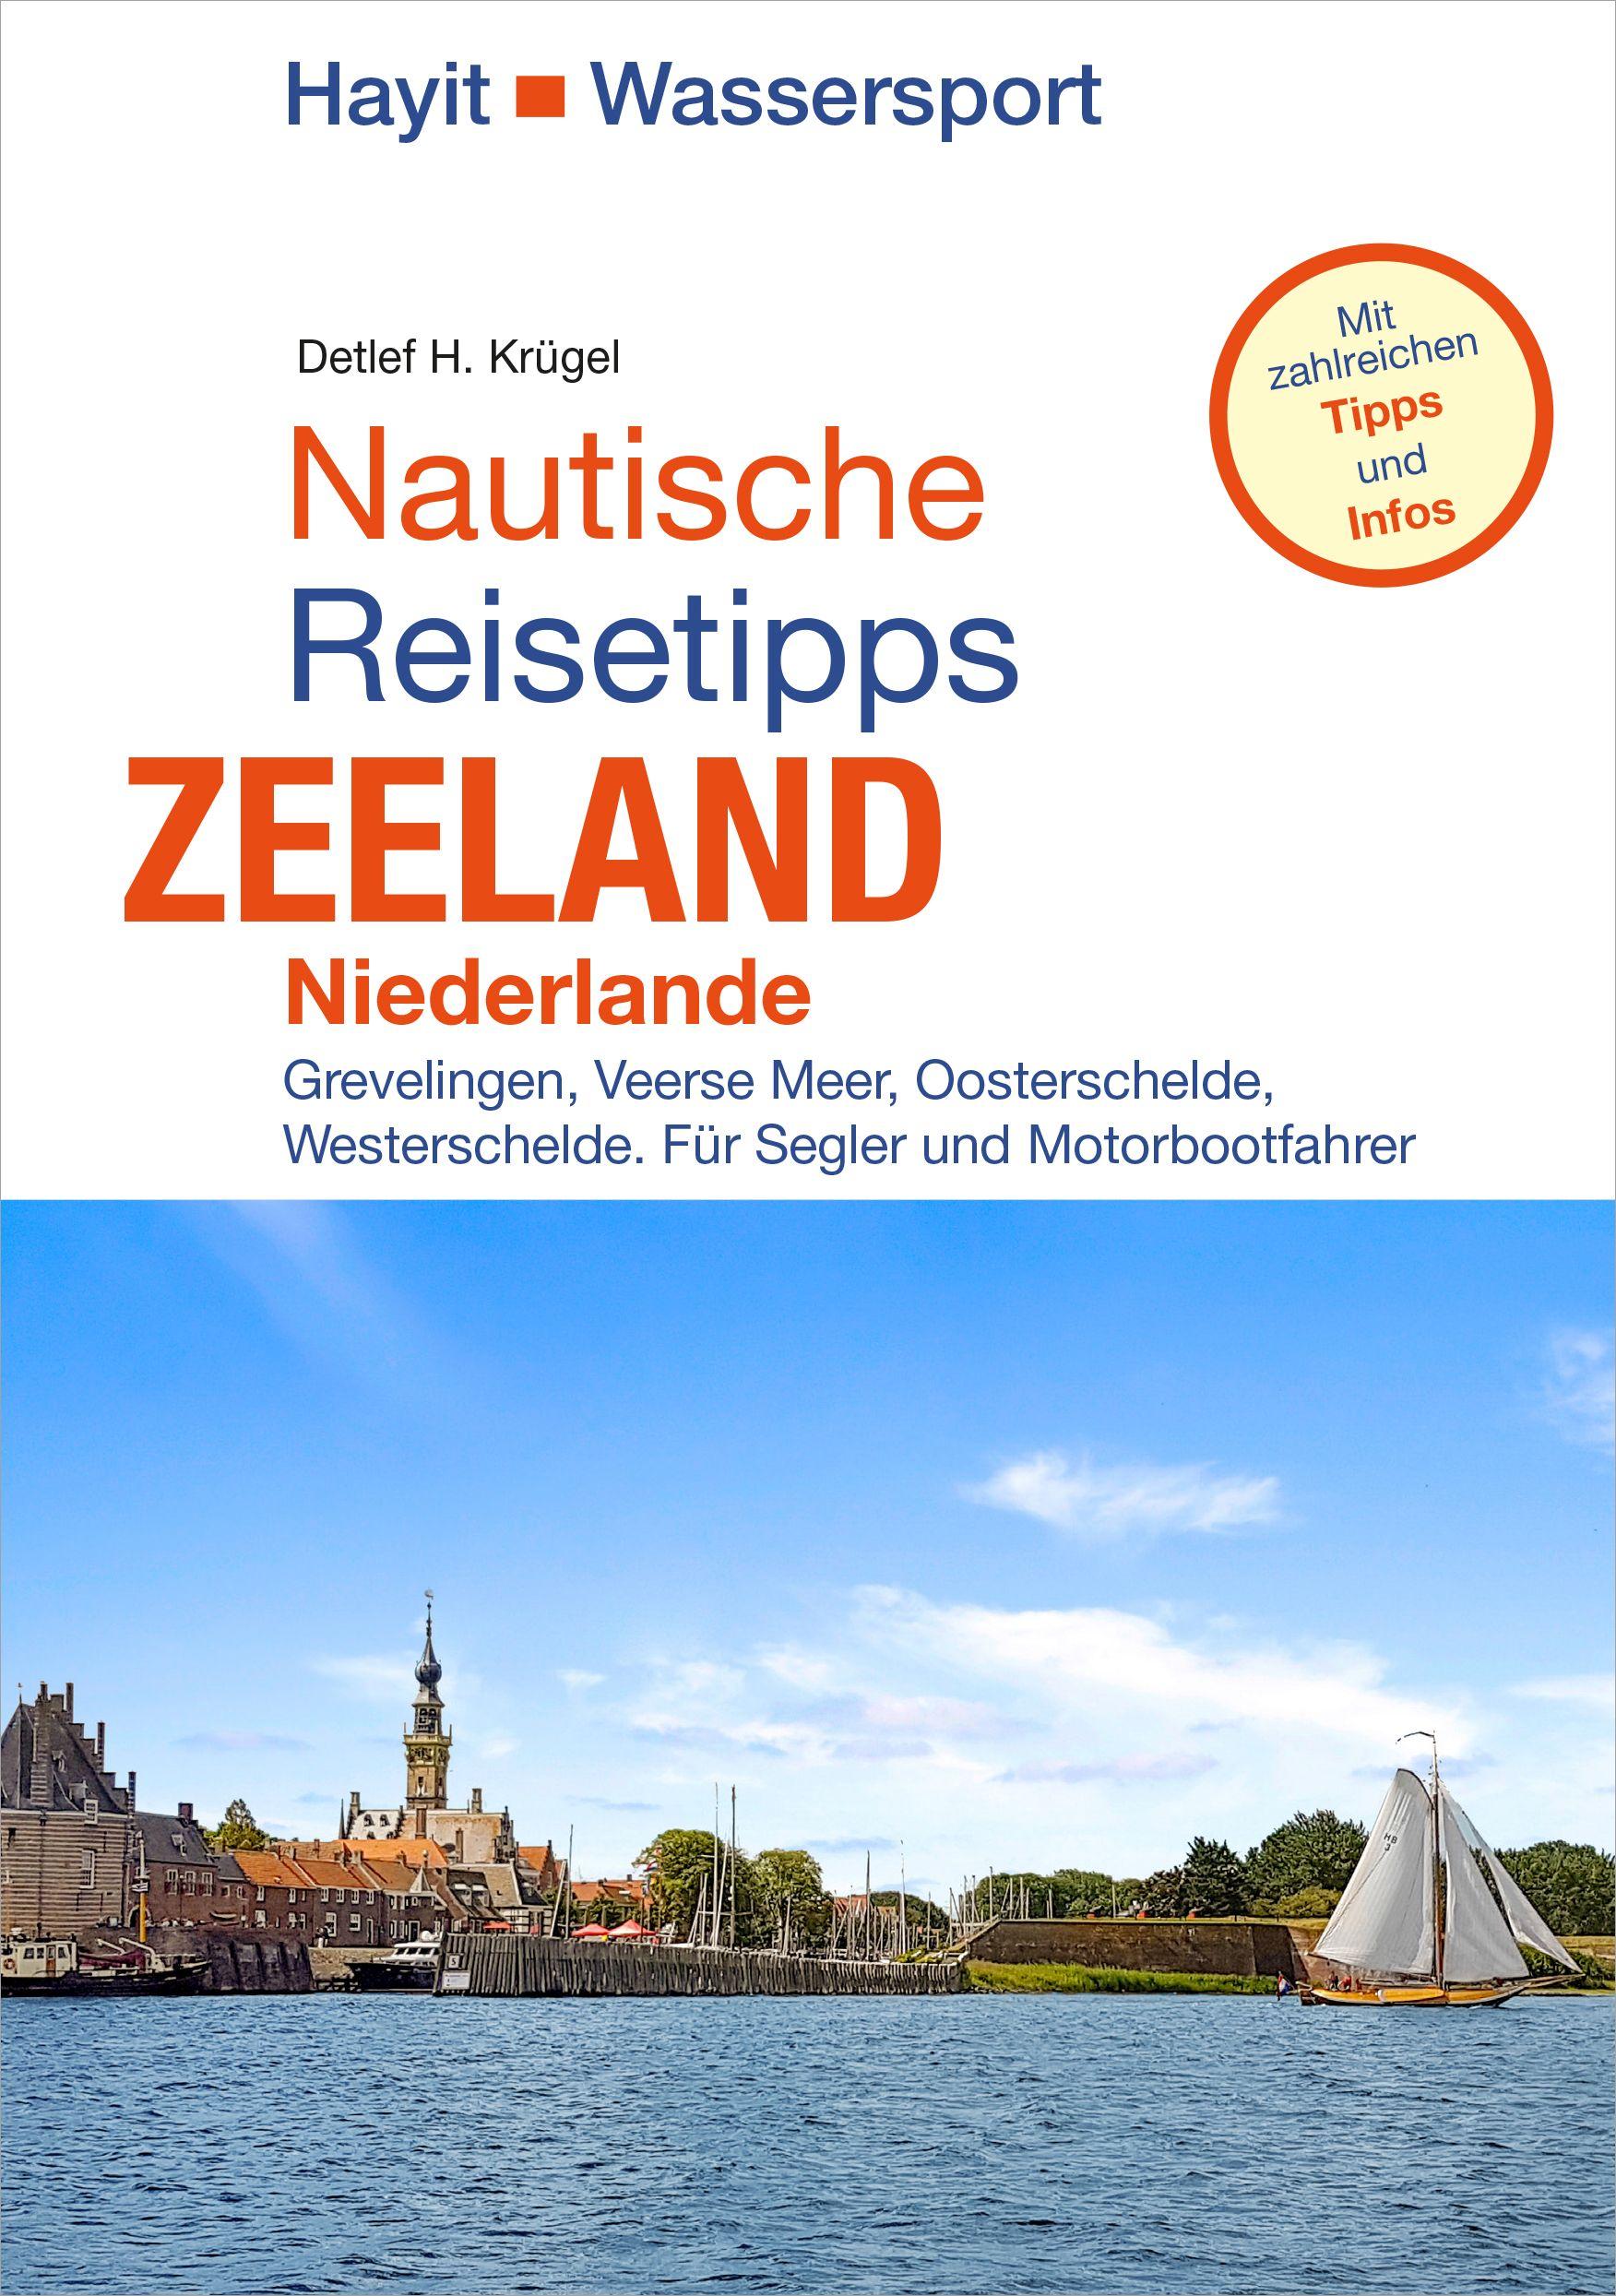 Nautische Reisetipps: Zeeland / Niederlande